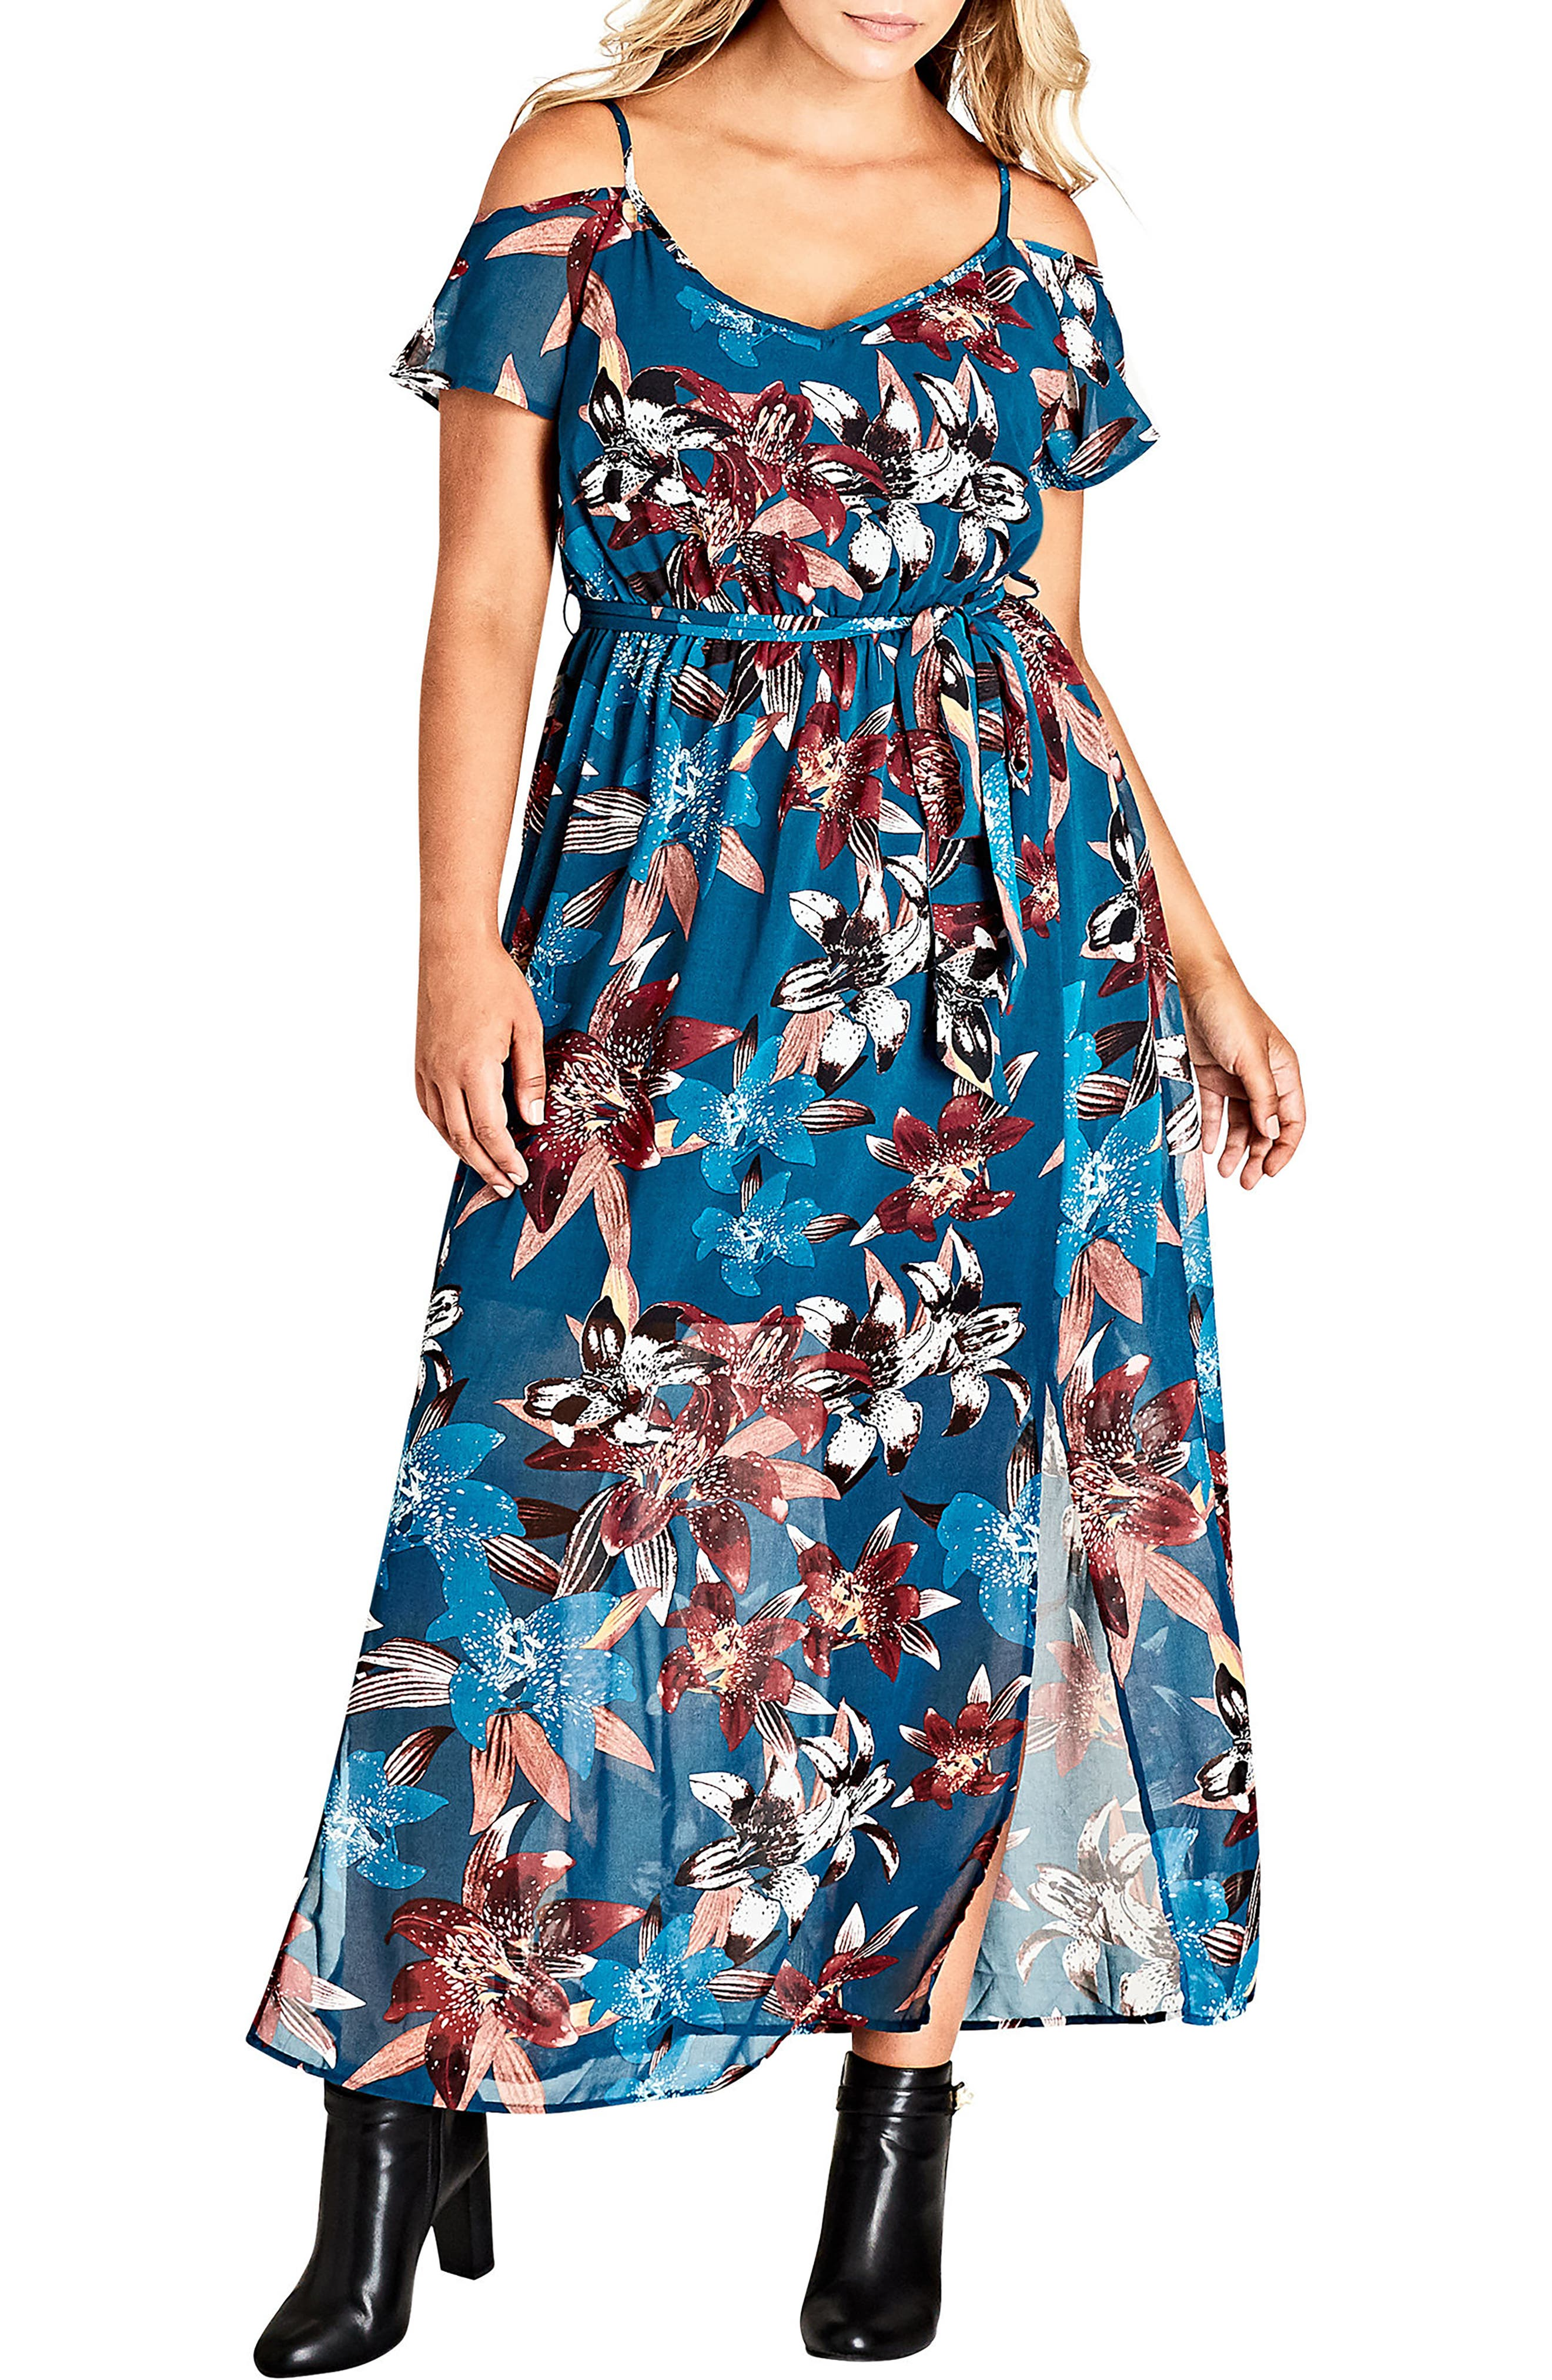 Fall Lily Off the Shoulder Maxi Dress,                             Main thumbnail 1, color,                             001